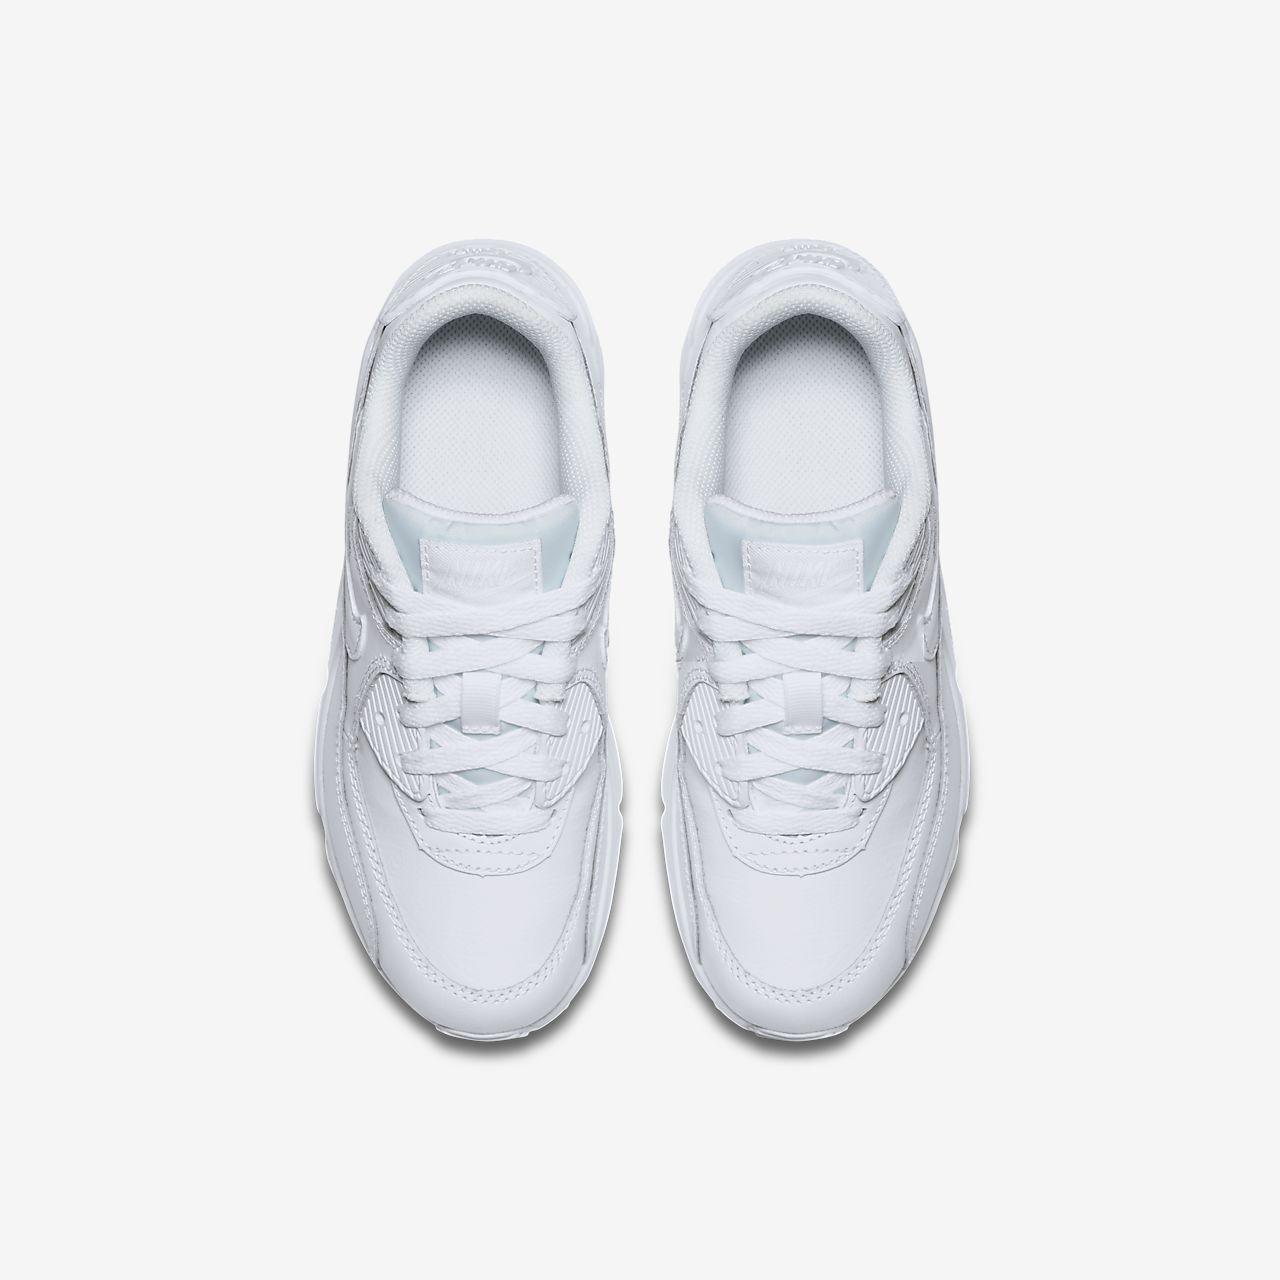 Nike Air Max 90 Leather Schuh für jüngere Kinder. Nike DE